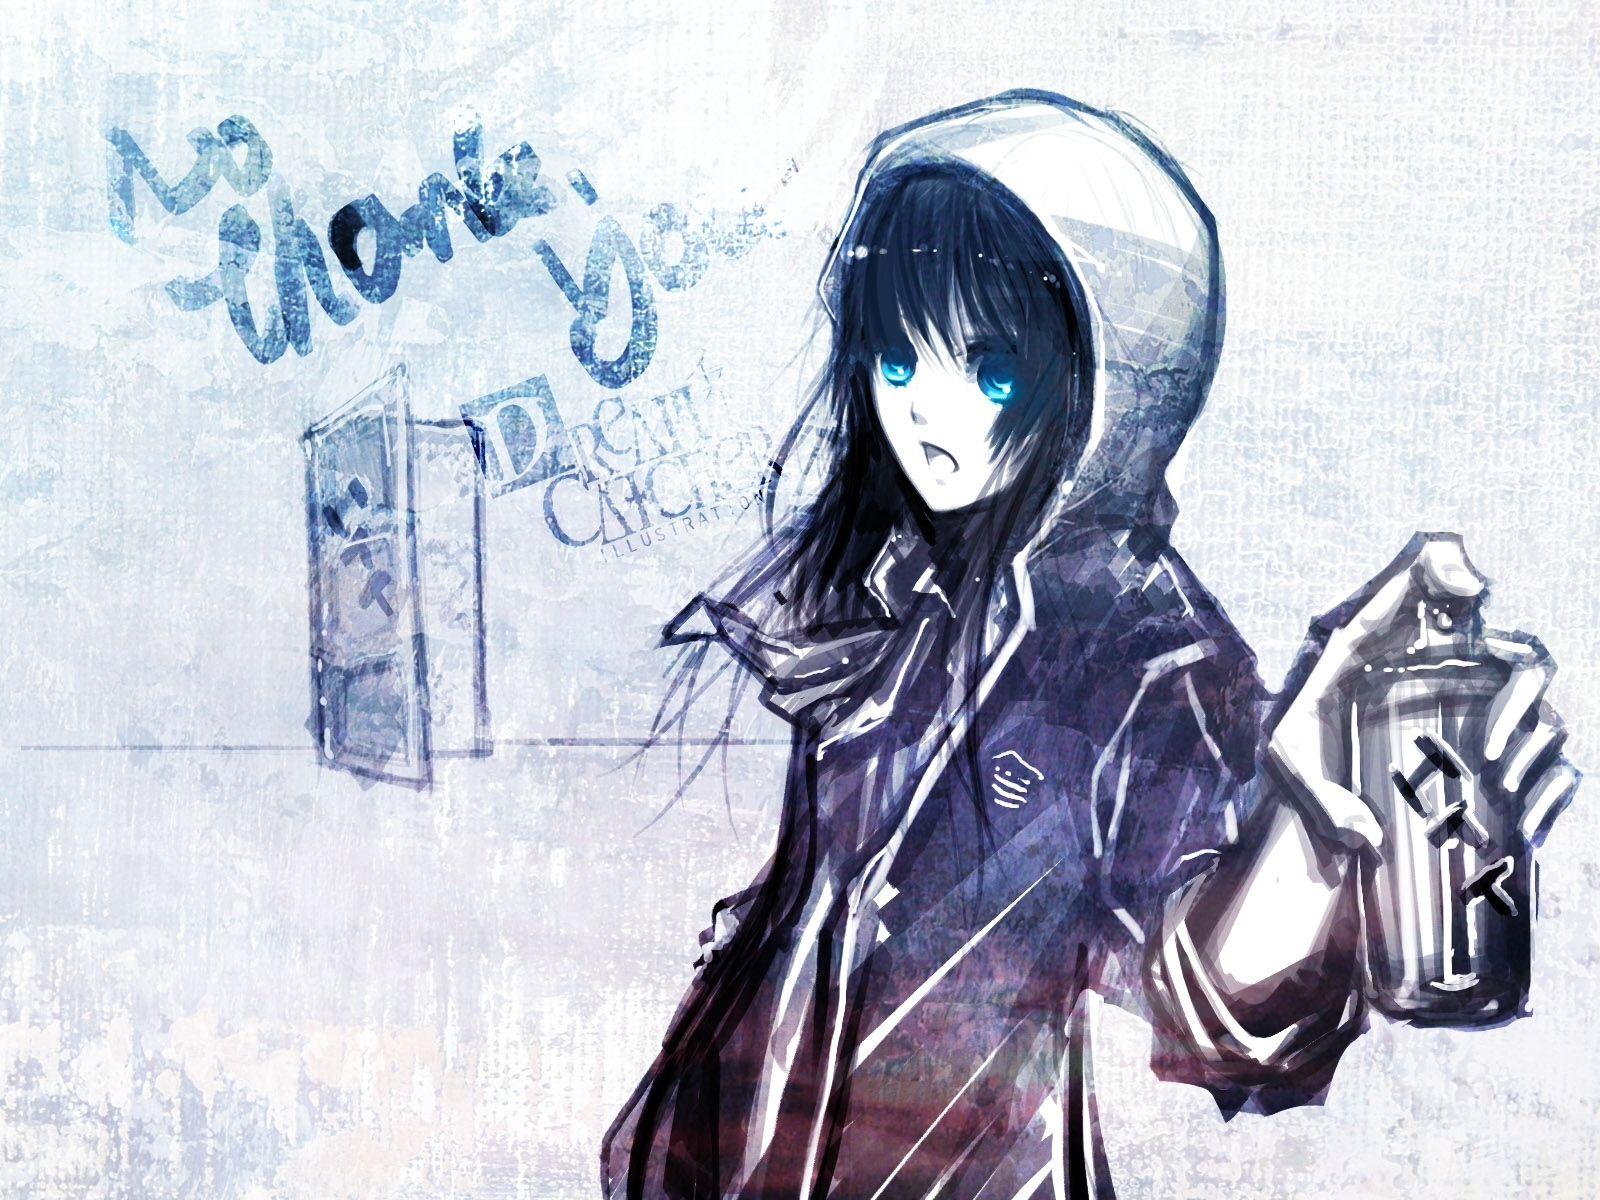 1466970 Konachan Android Wallpaper Anime Hd Anime Wallpapers Emo Wallpaper